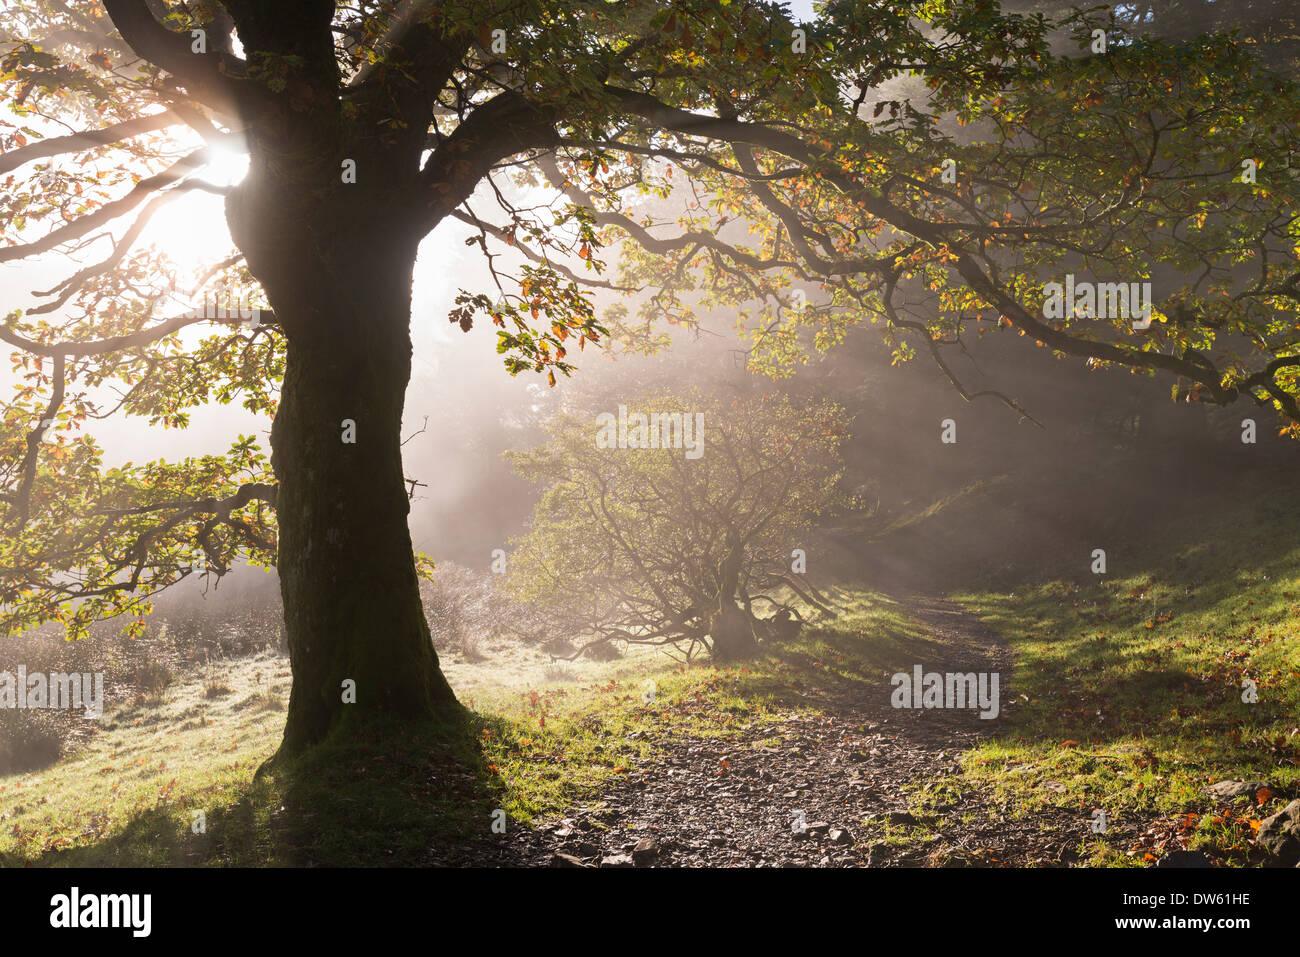 Lake District sendero serpenteante a través de Holme Wood, Loweswater, Cumbria, Inglaterra. Otoño (Noviembre) de 2013. Imagen De Stock